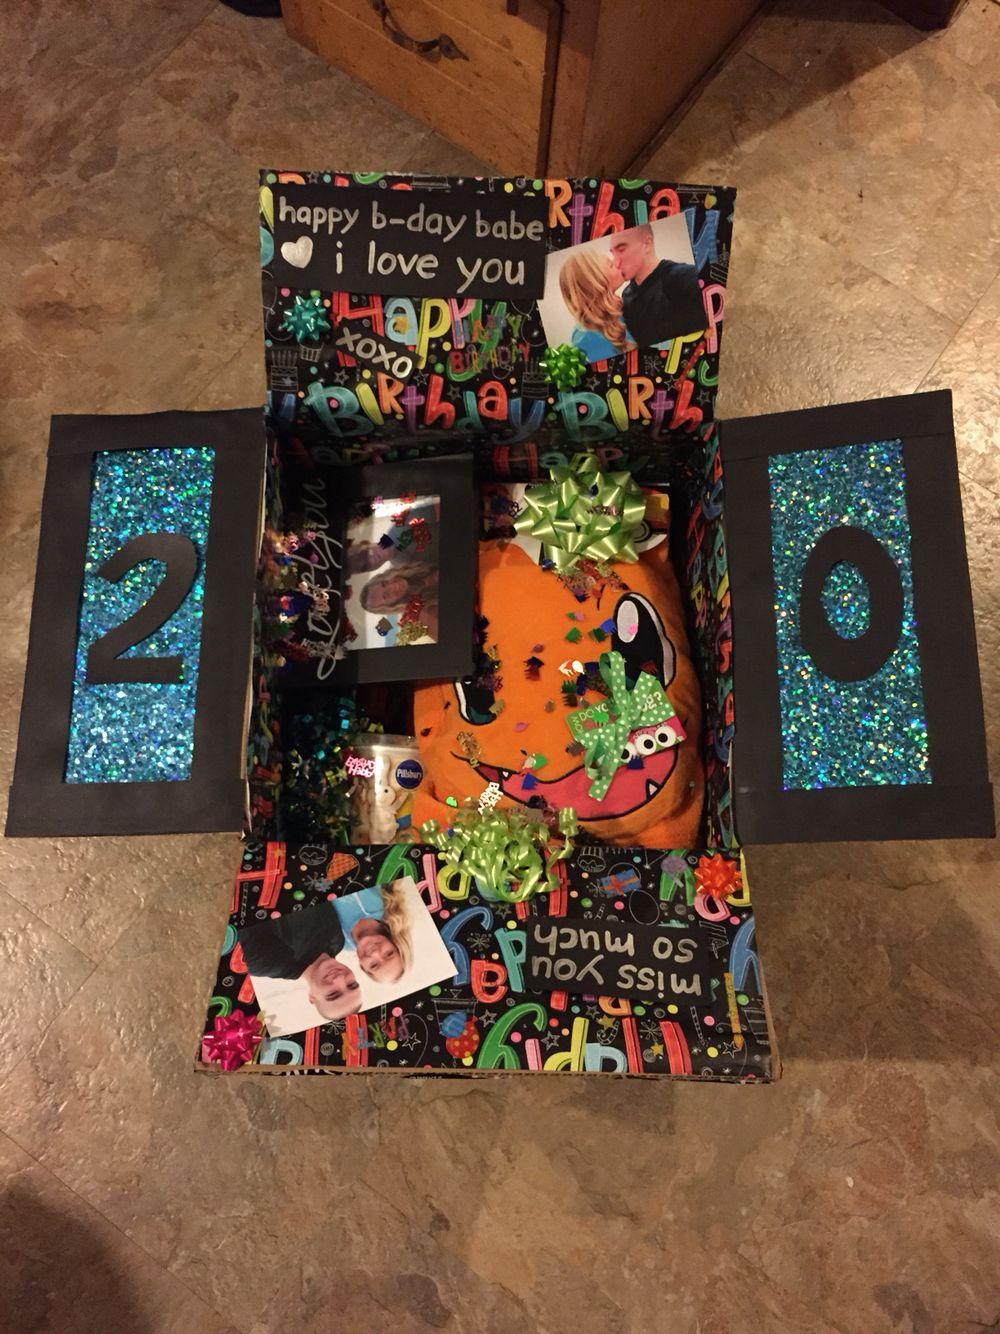 birthday care package for my boyfriend! random